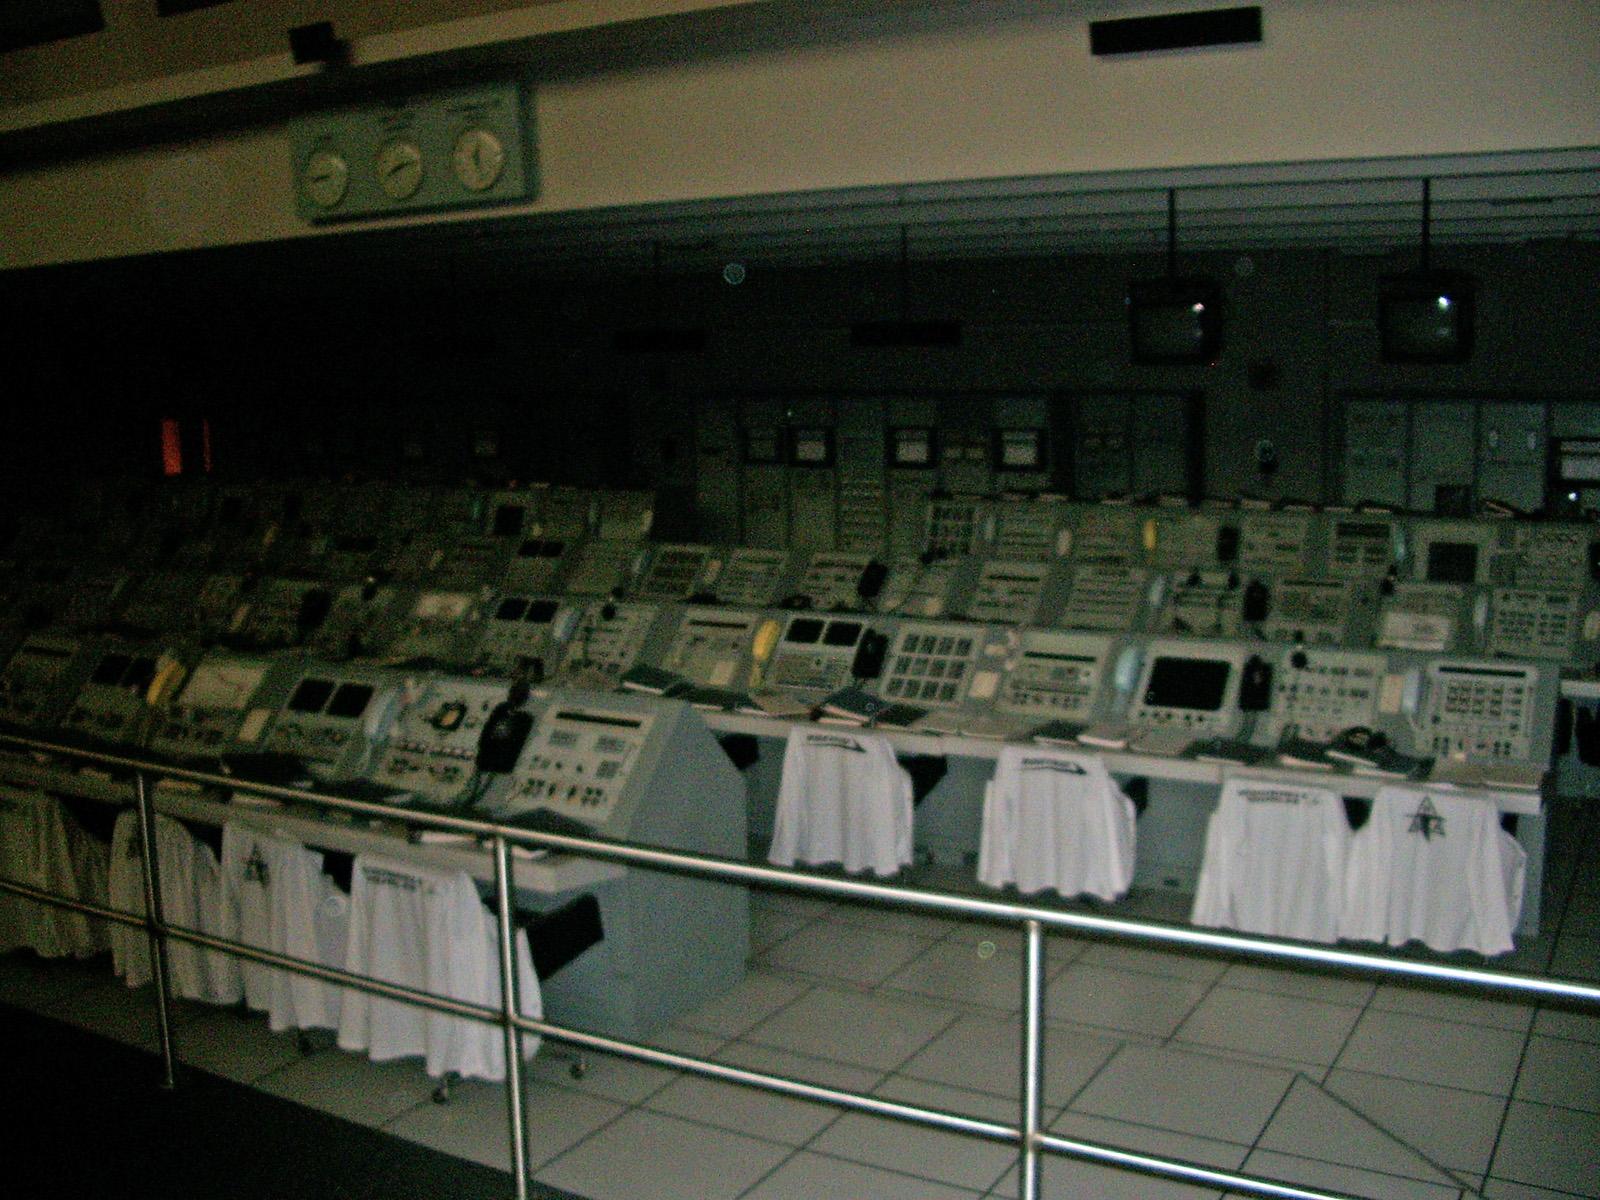 Apollo Mission Control Center - Pics about space